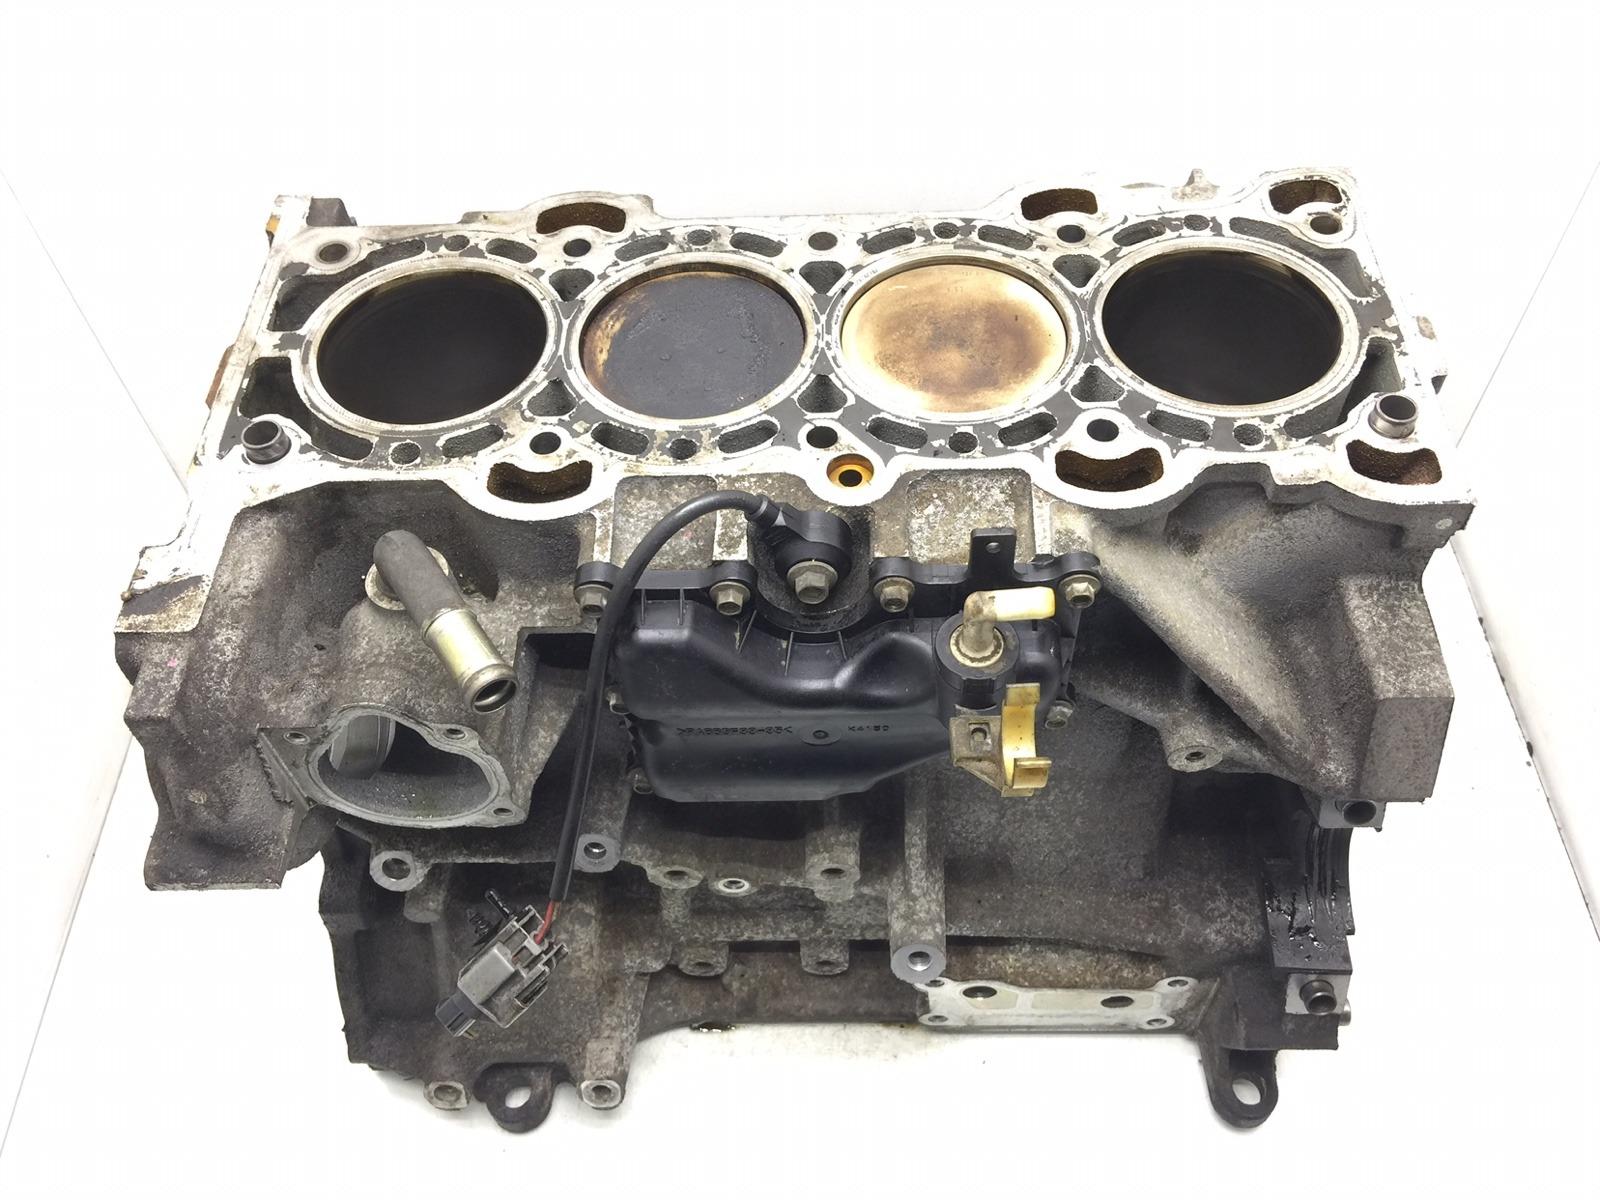 Блок цилиндров Mazda 6 1.8 I 2005 (б/у)